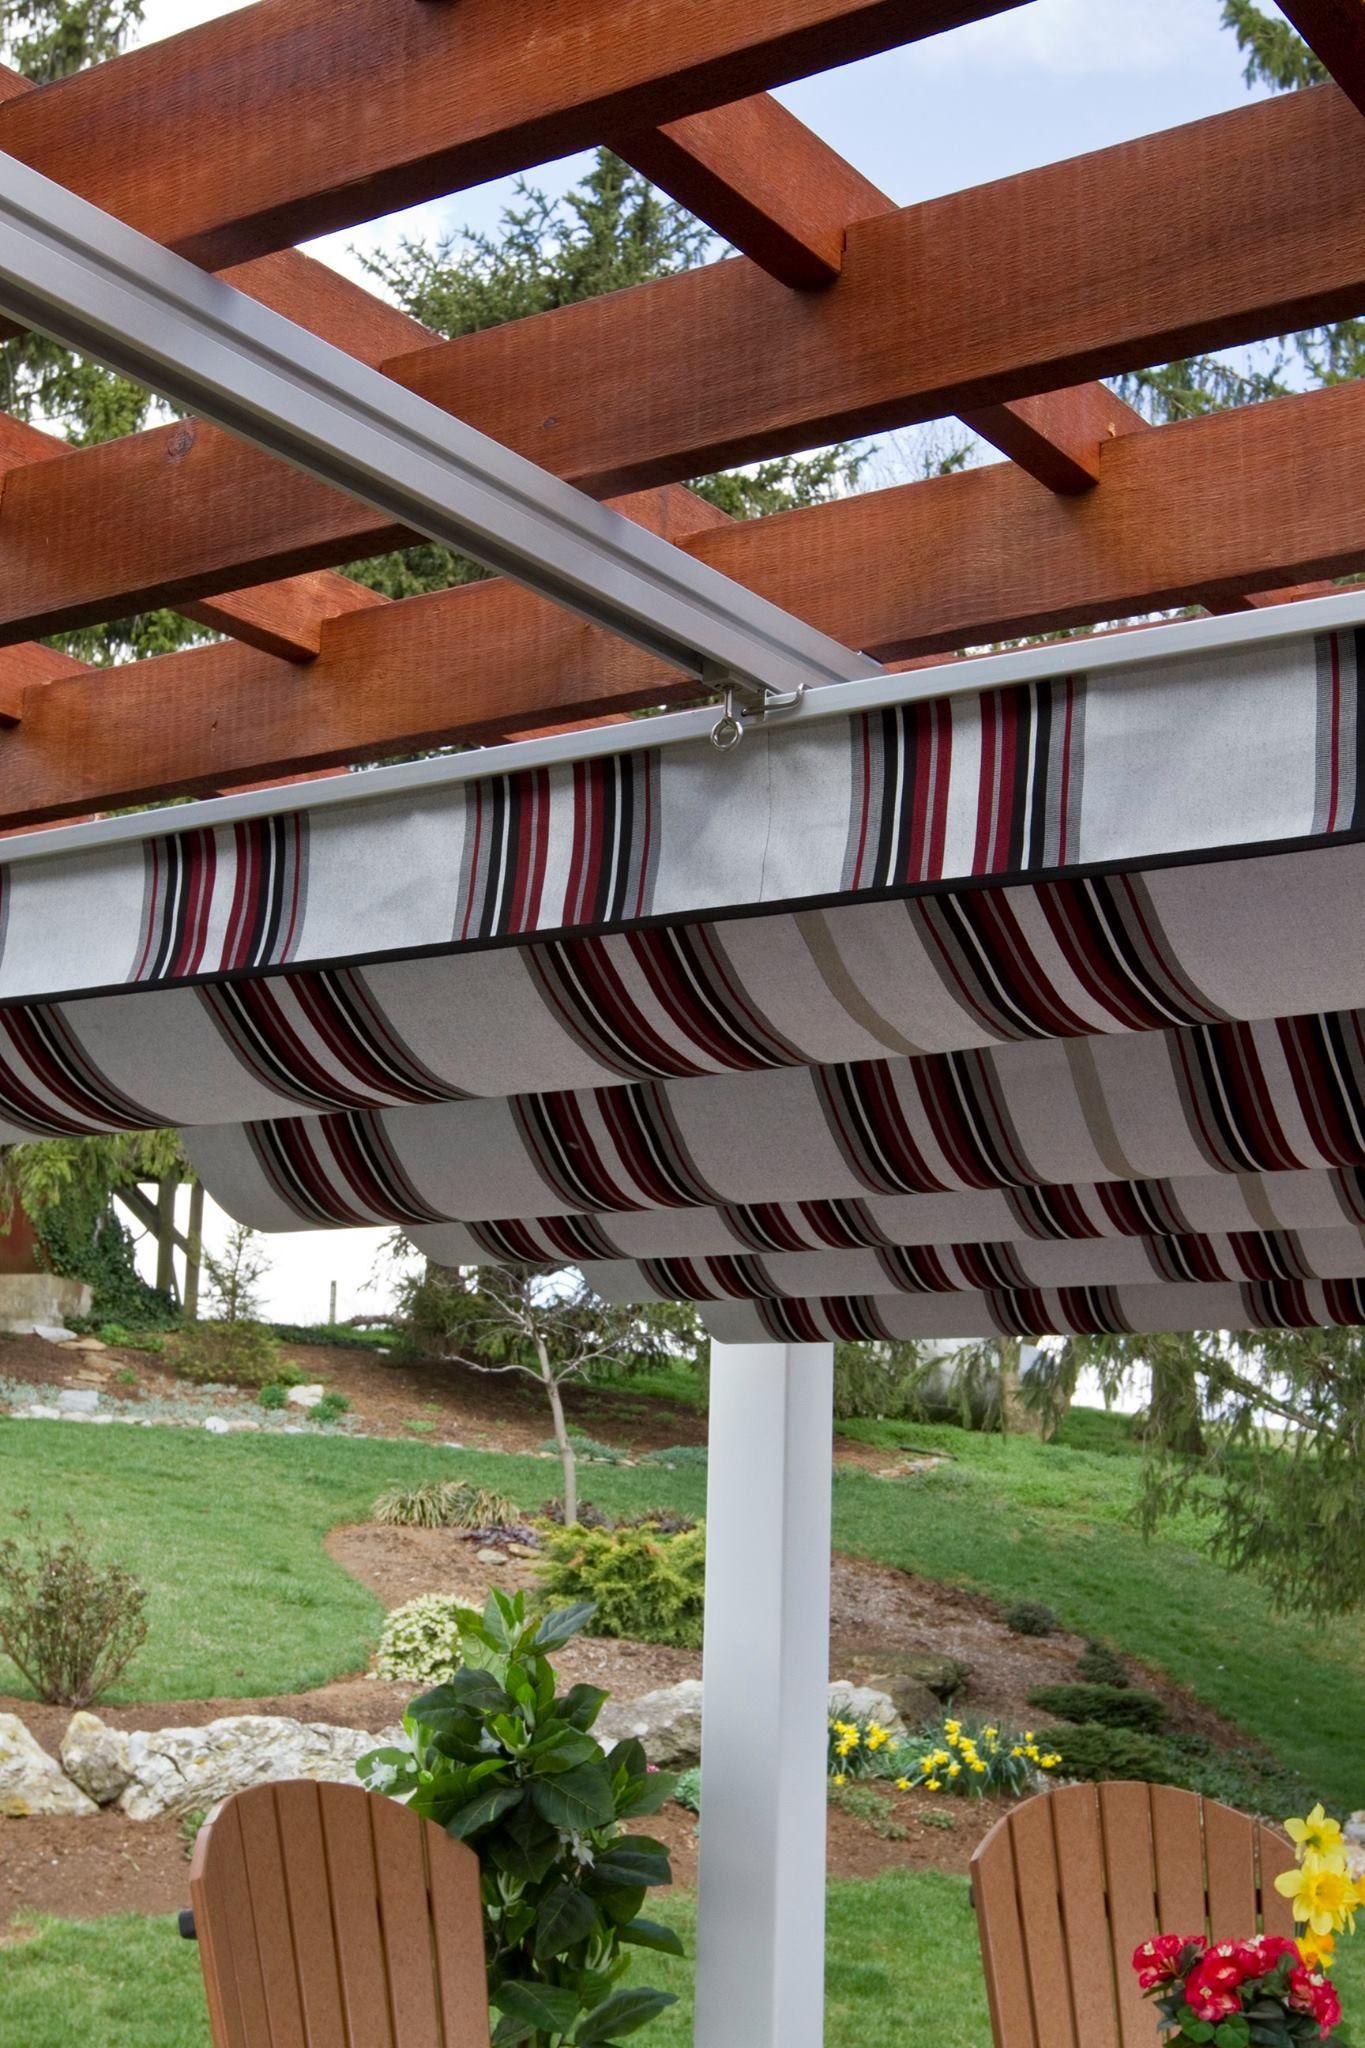 pergola shade canopy on backyard garden structures outdoor gazebos pergola shade patio canopy canopy outdoor pinterest